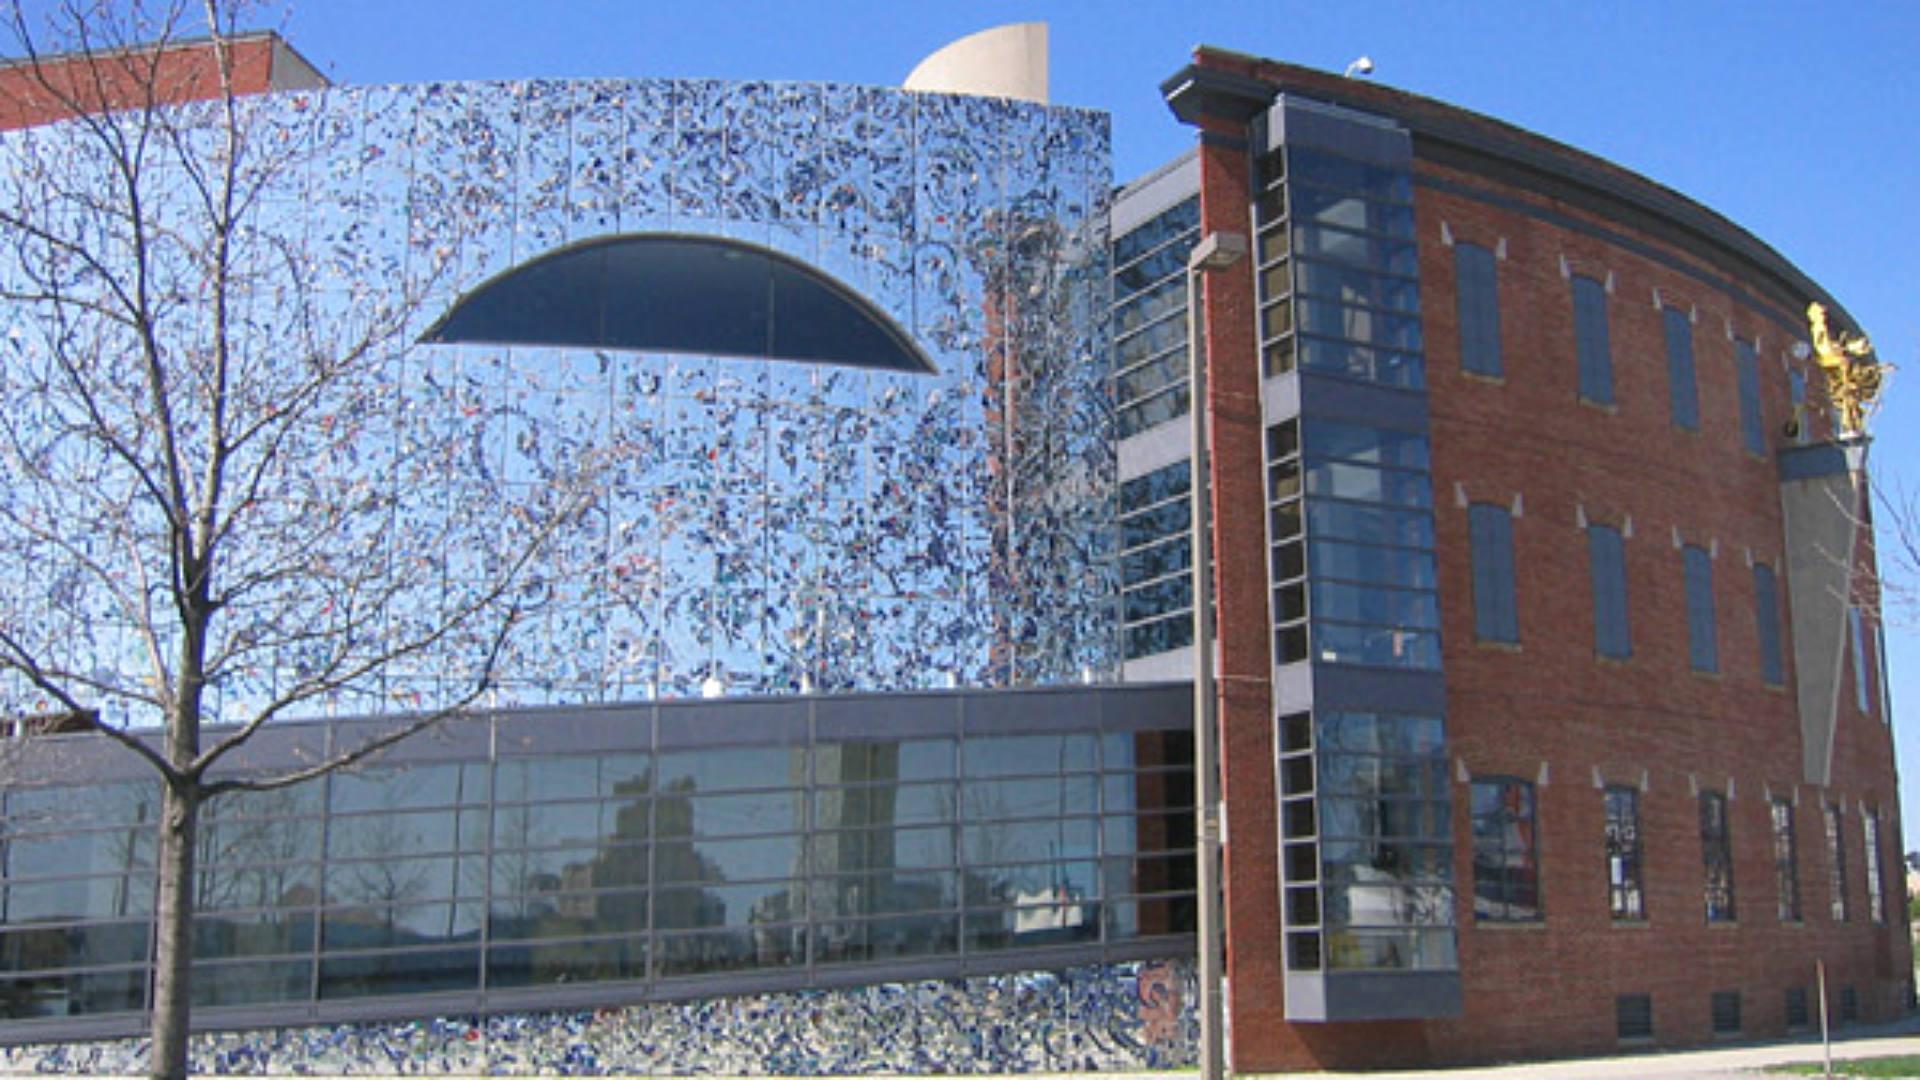 American_Visionary_Arts_Museum_Baltimore_FTR-wiki.jpg